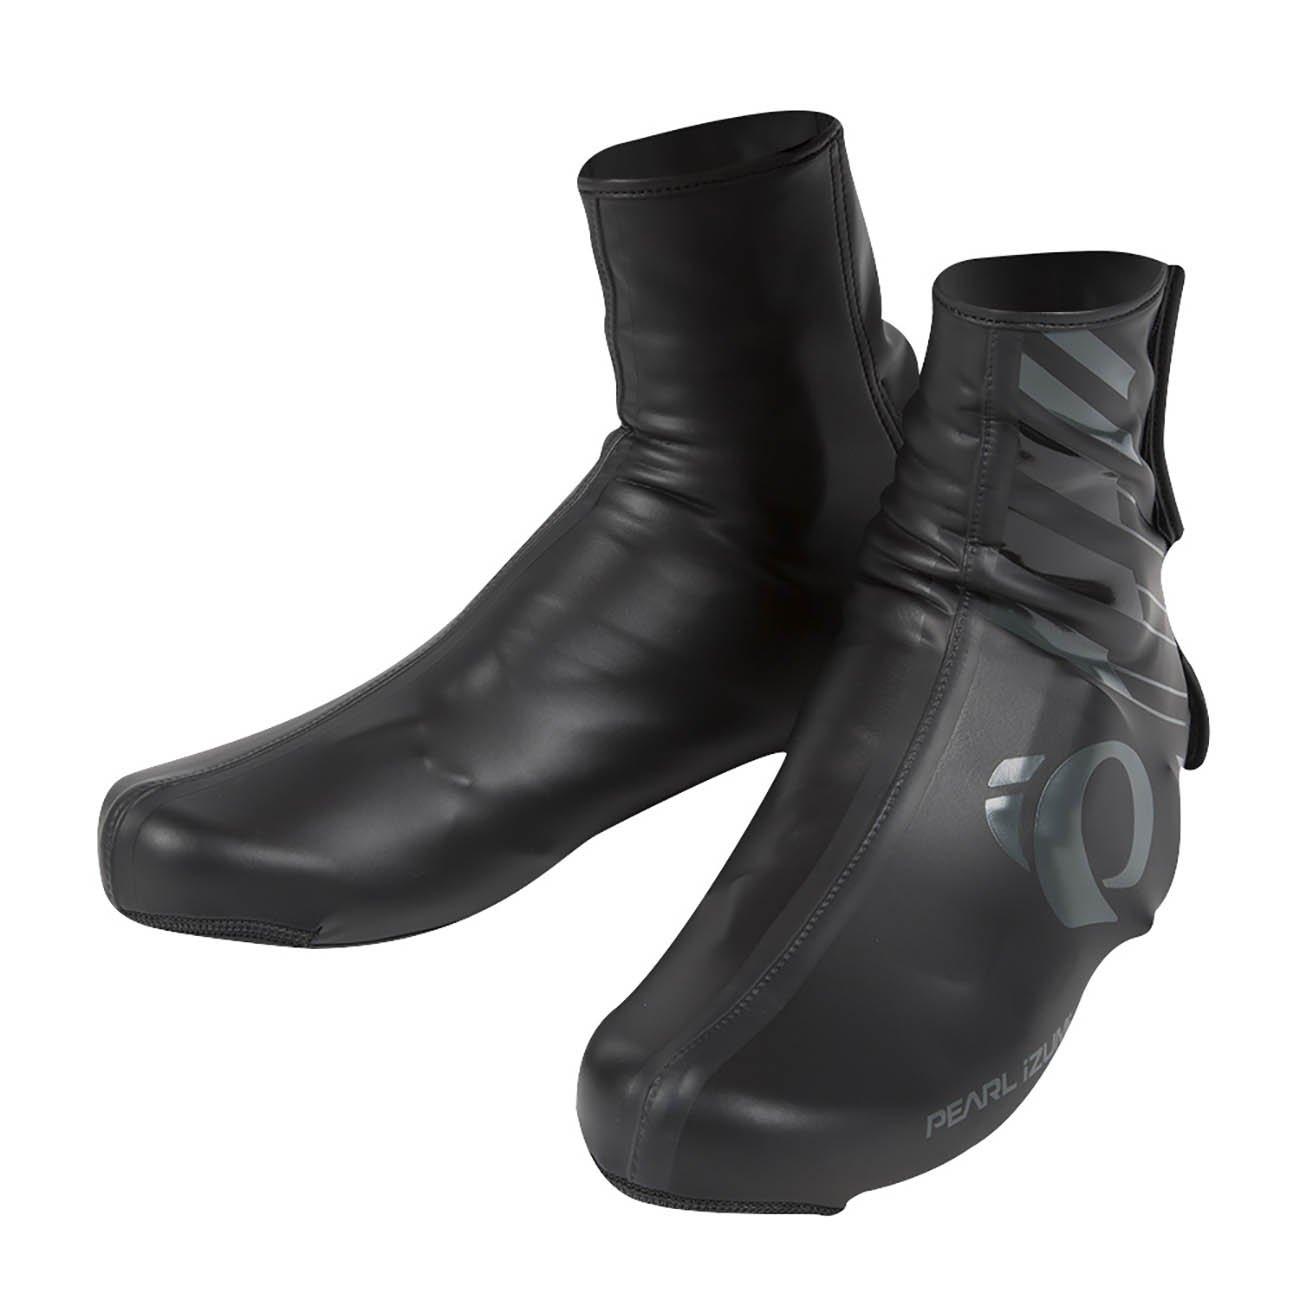 Pearl iZUMi Pro Barrier WxB Shoe Cover, Black, Large